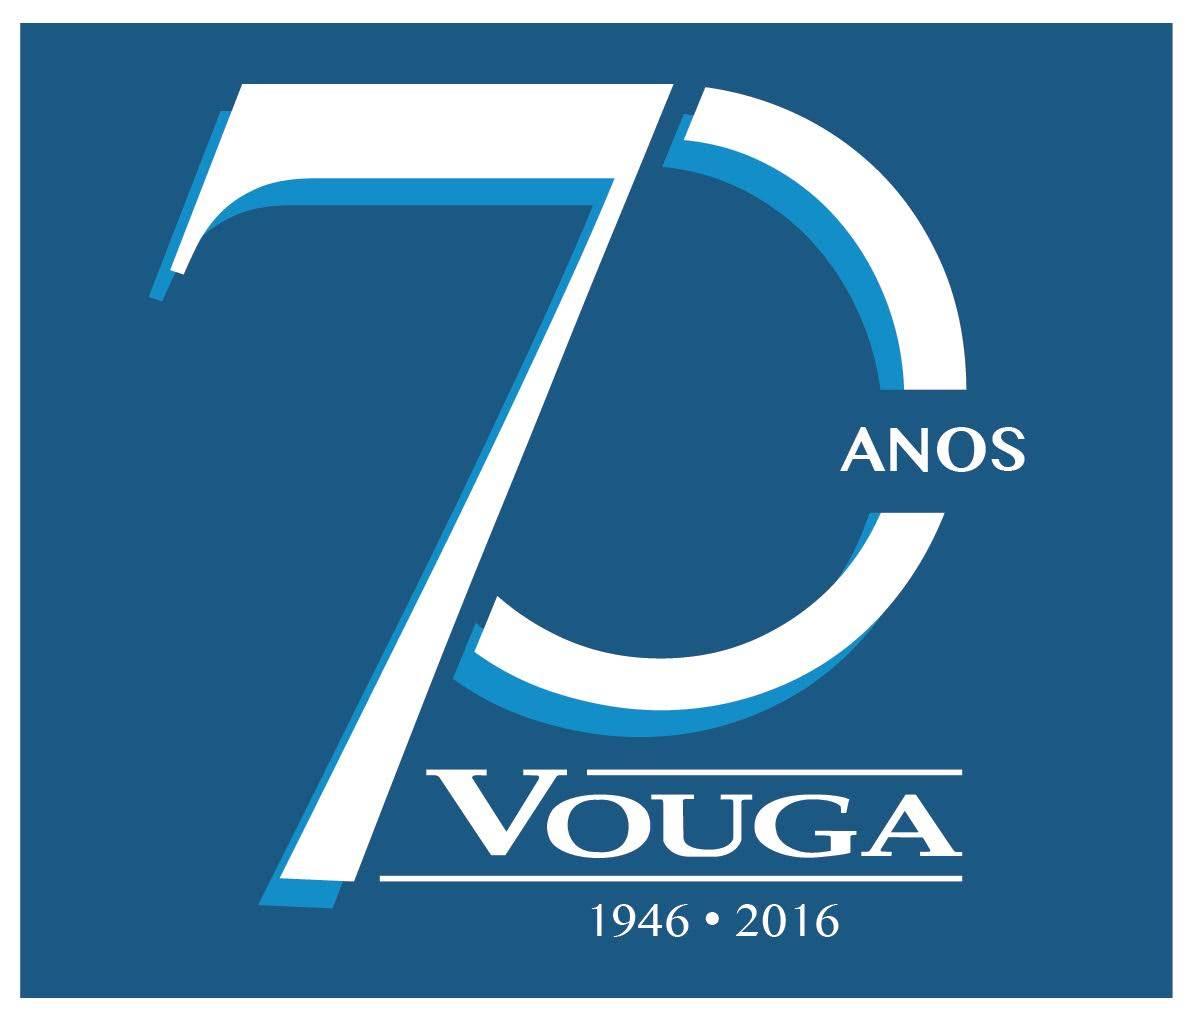 SCVouva 70 anos 2016